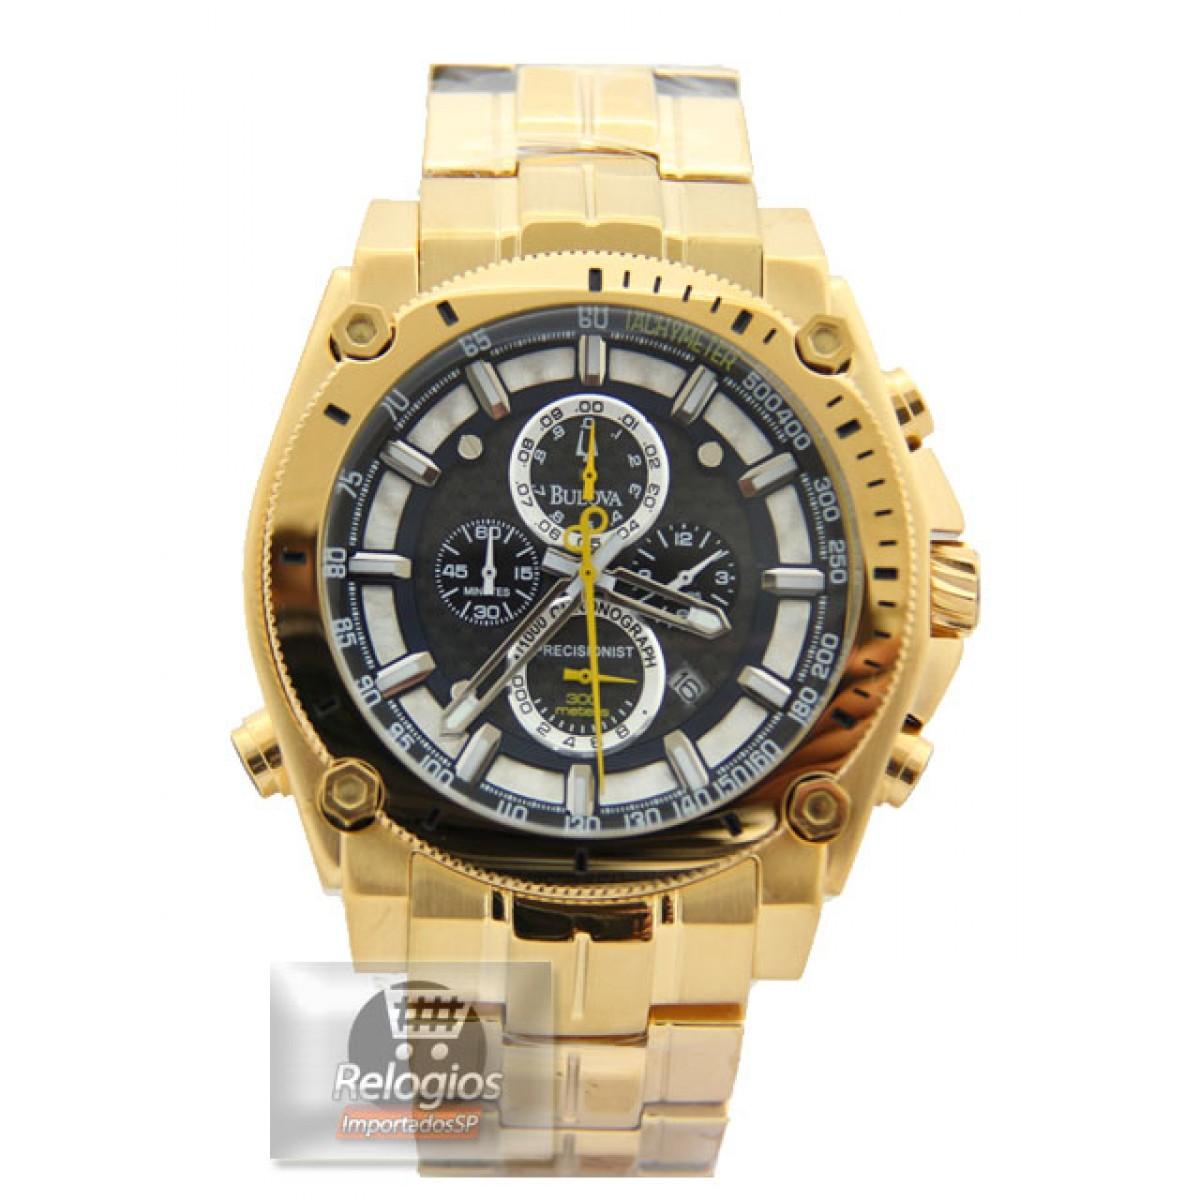 dfb70229bec Relógio Réplica Bulova 96b175 Gold Black